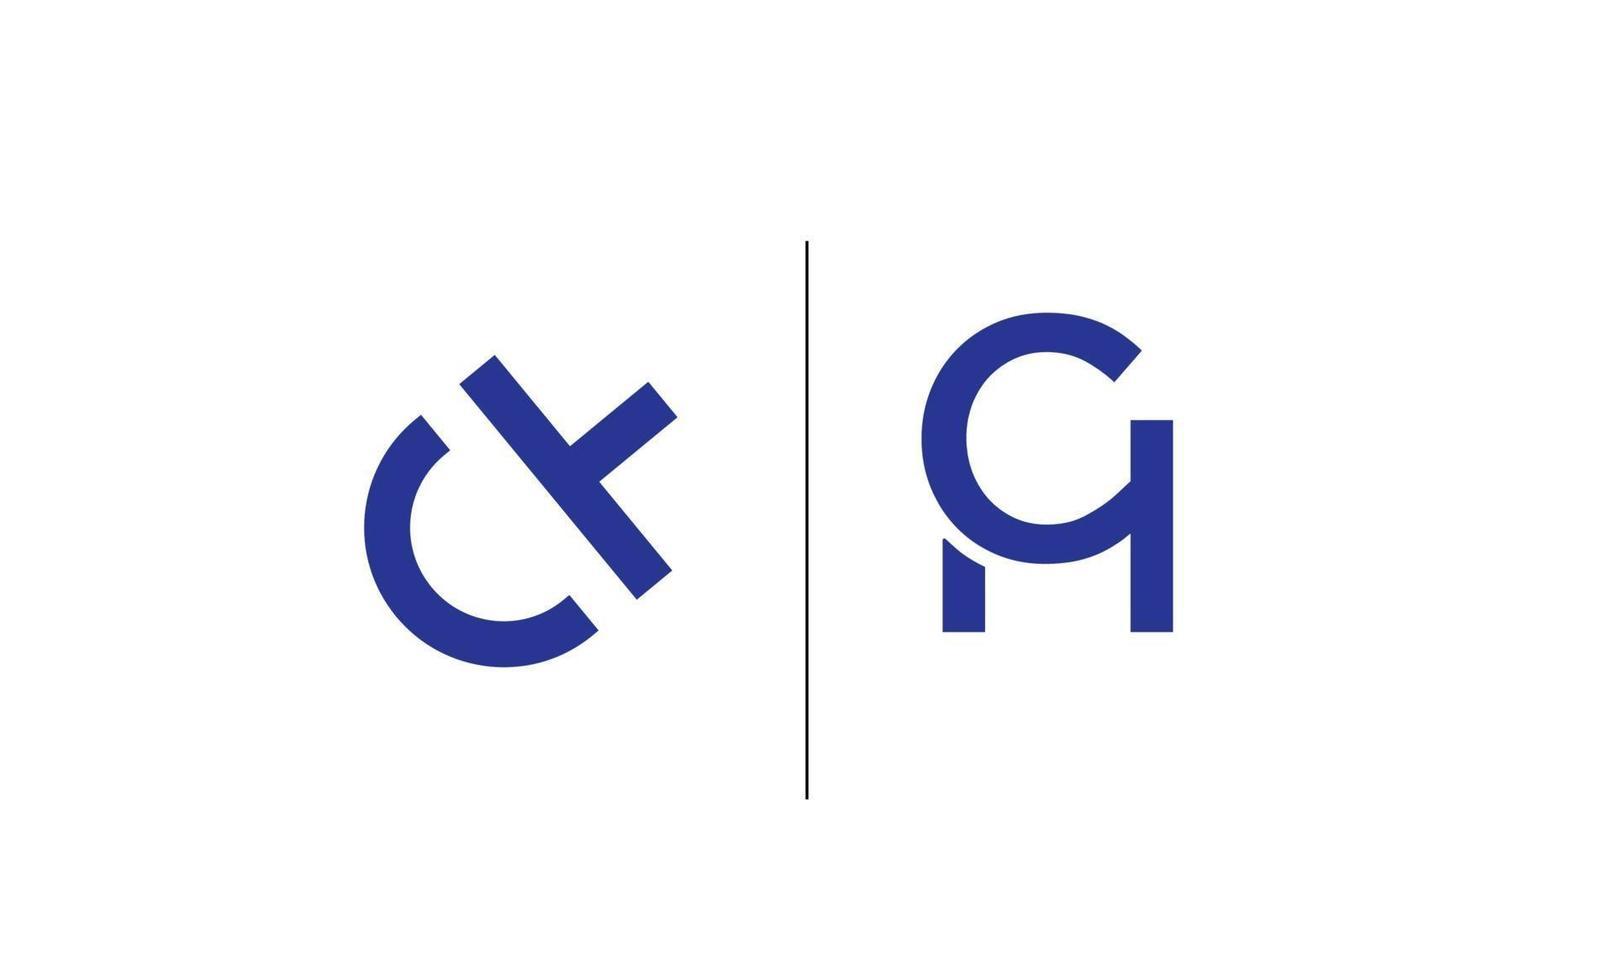 ch iniziale, hc logo design template vector